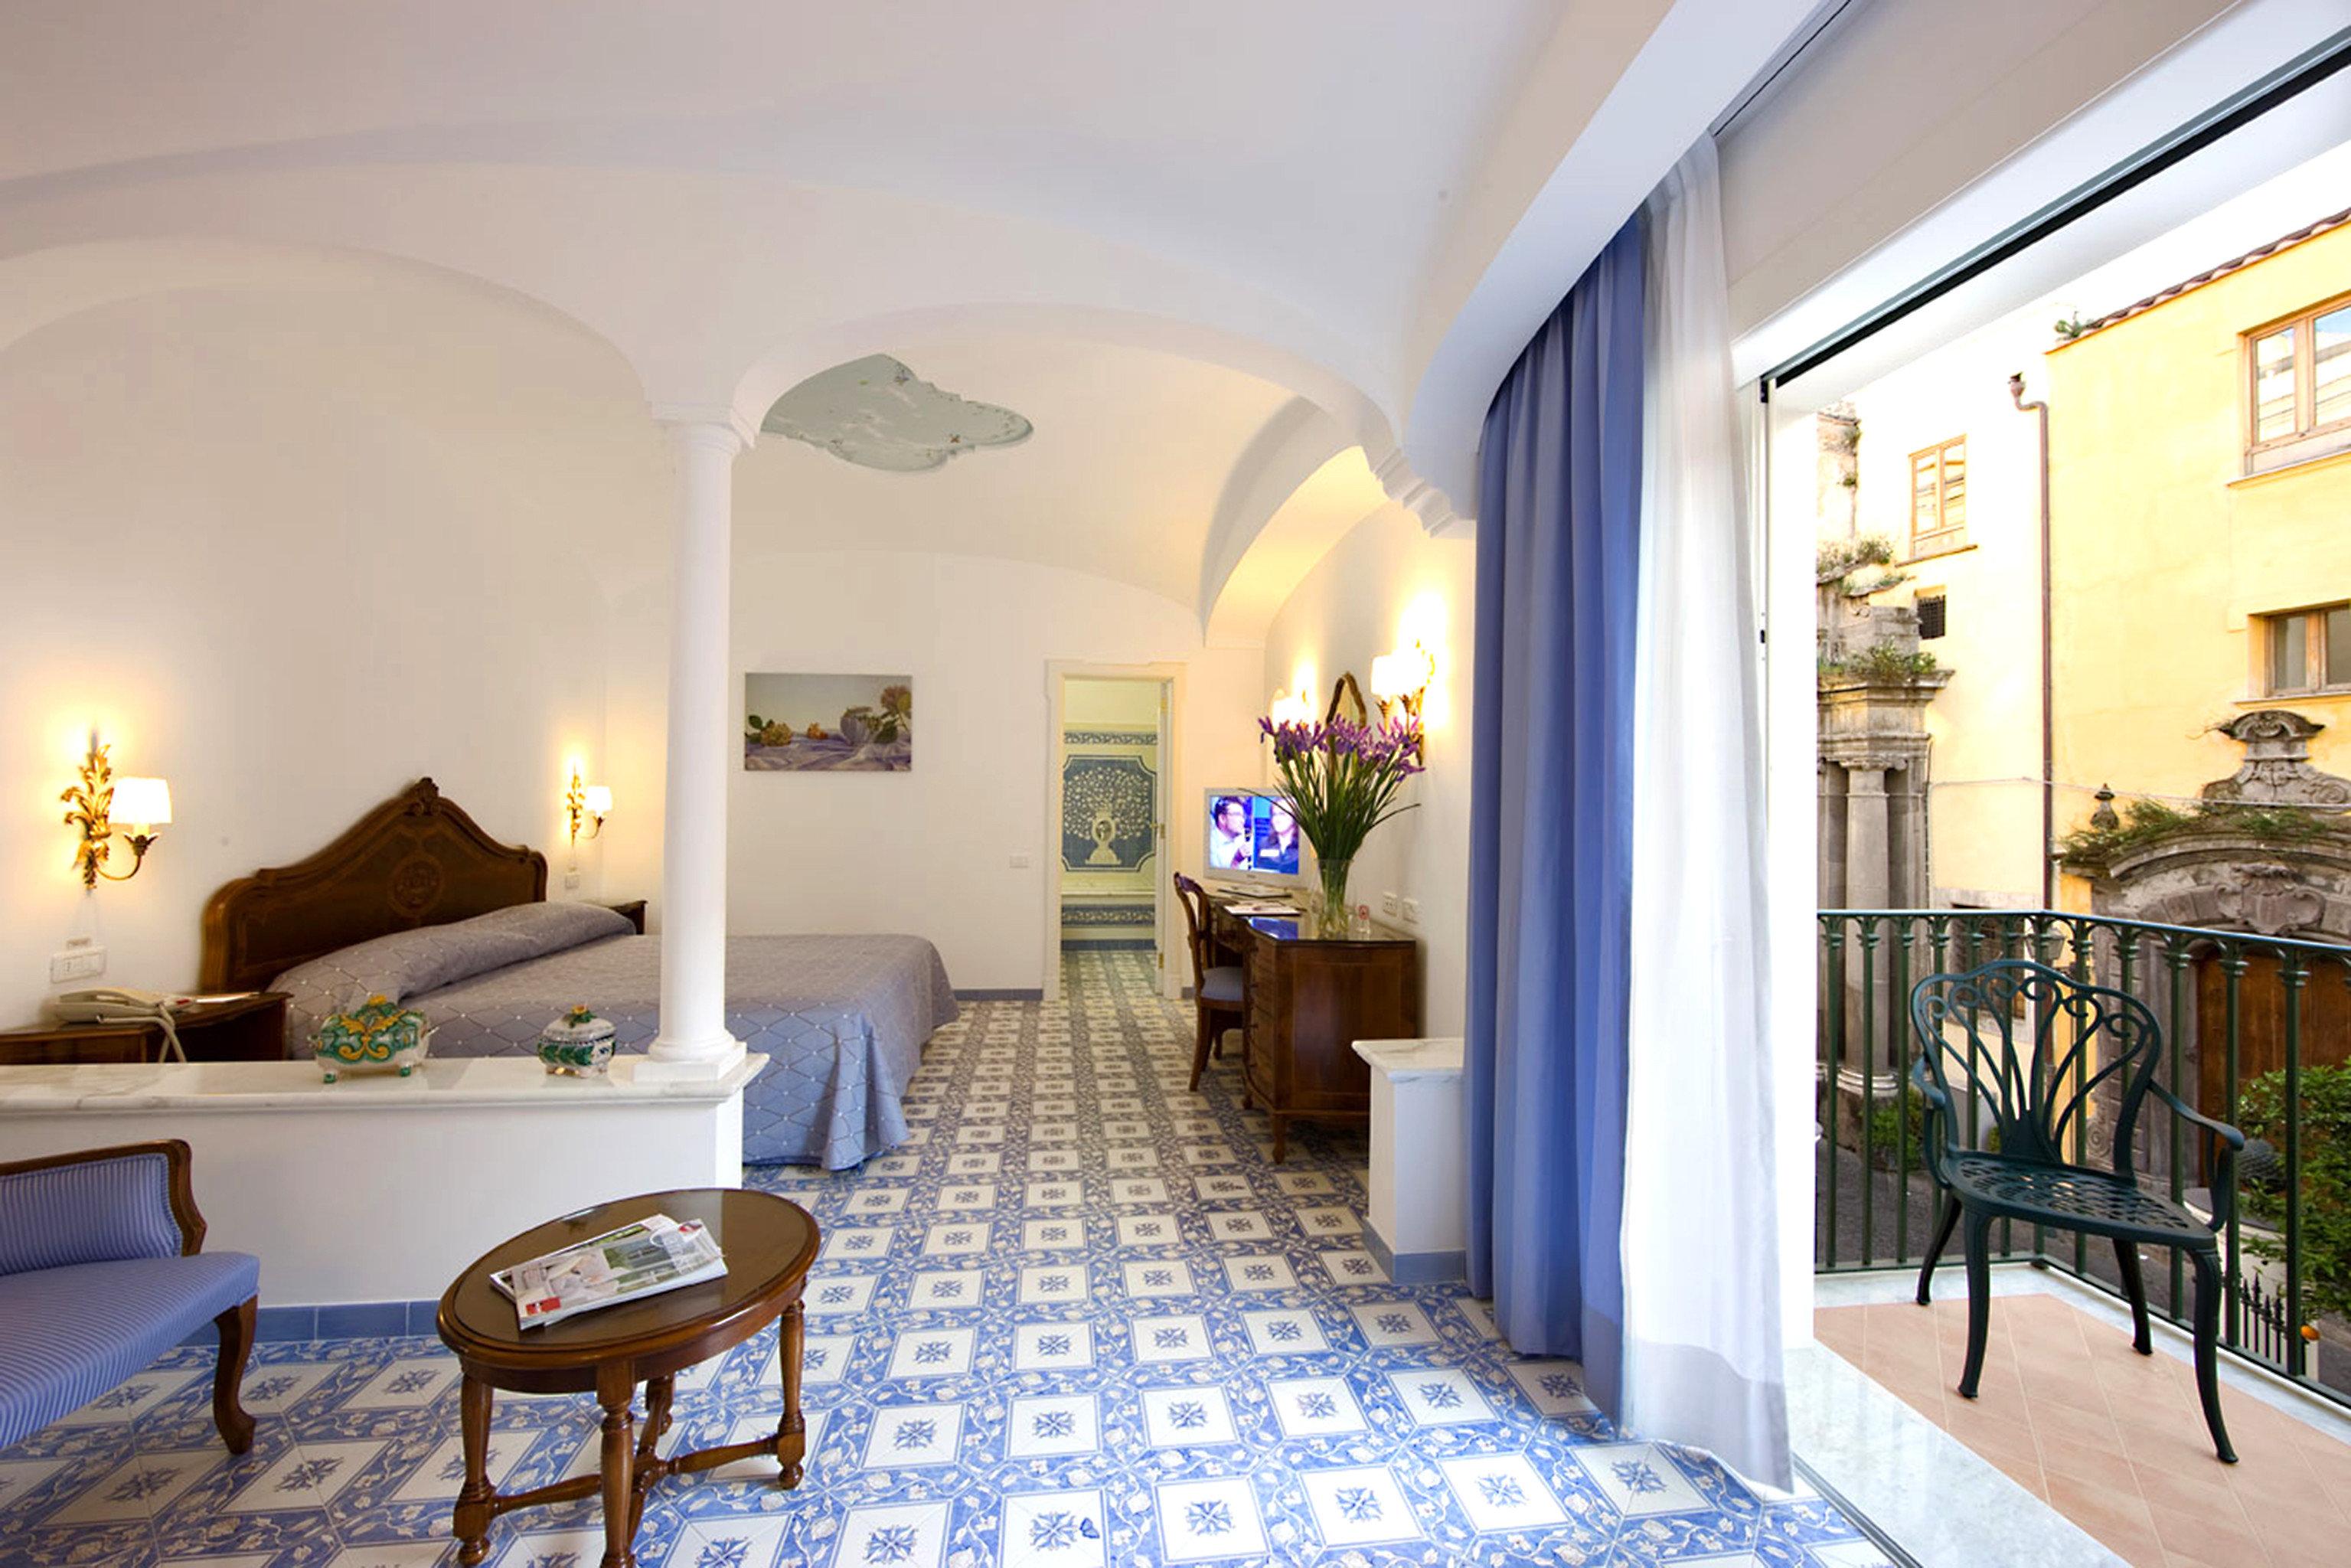 Balcony Bedroom Classic Scenic views Sea property Villa Resort home mansion Suite living room condominium cottage hacienda rug